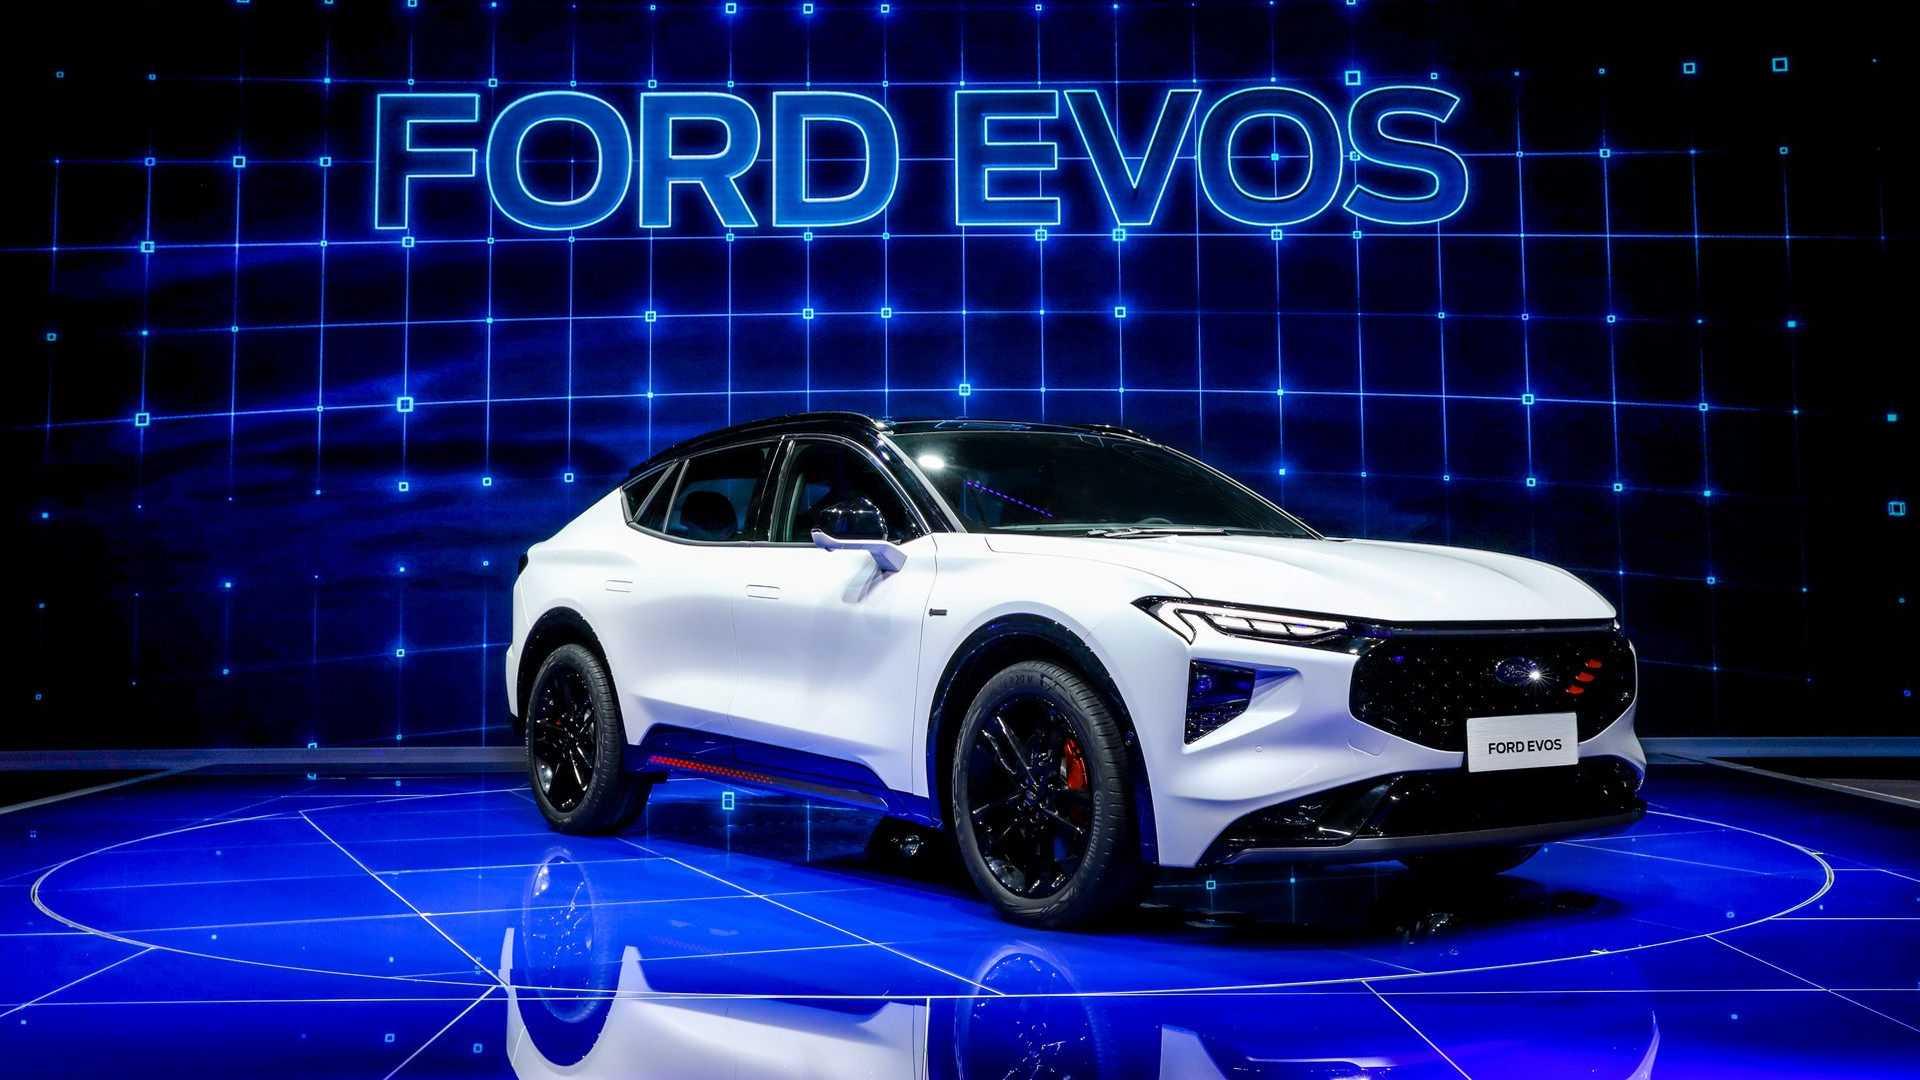 Ford-Evos-1